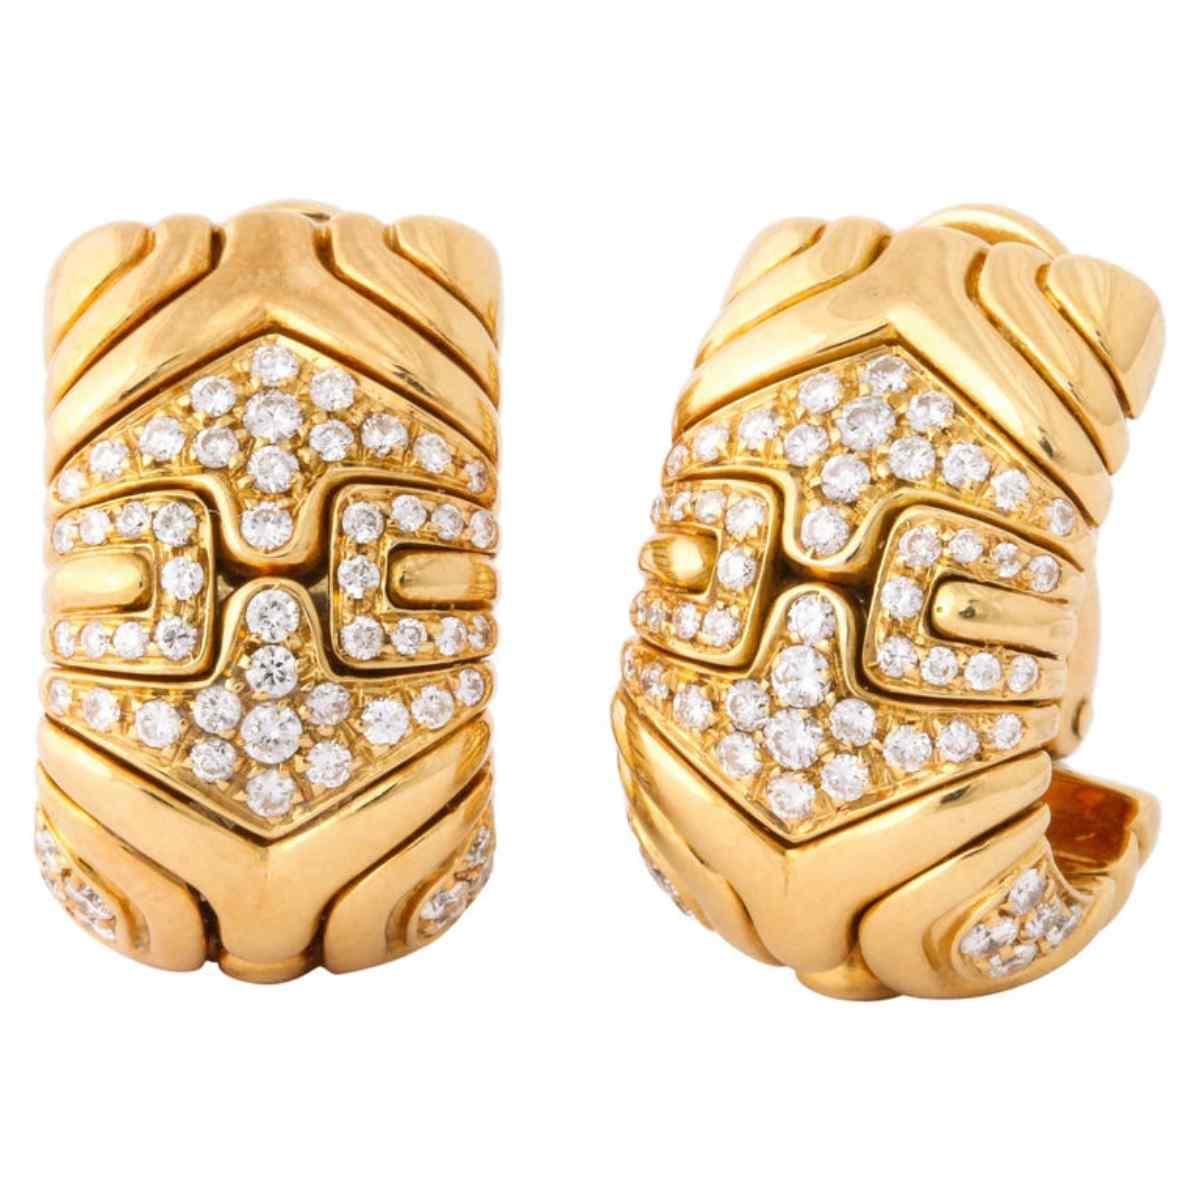 Bulgari, Pair of 18 Karat Gold and Diamond Parentesi Earring